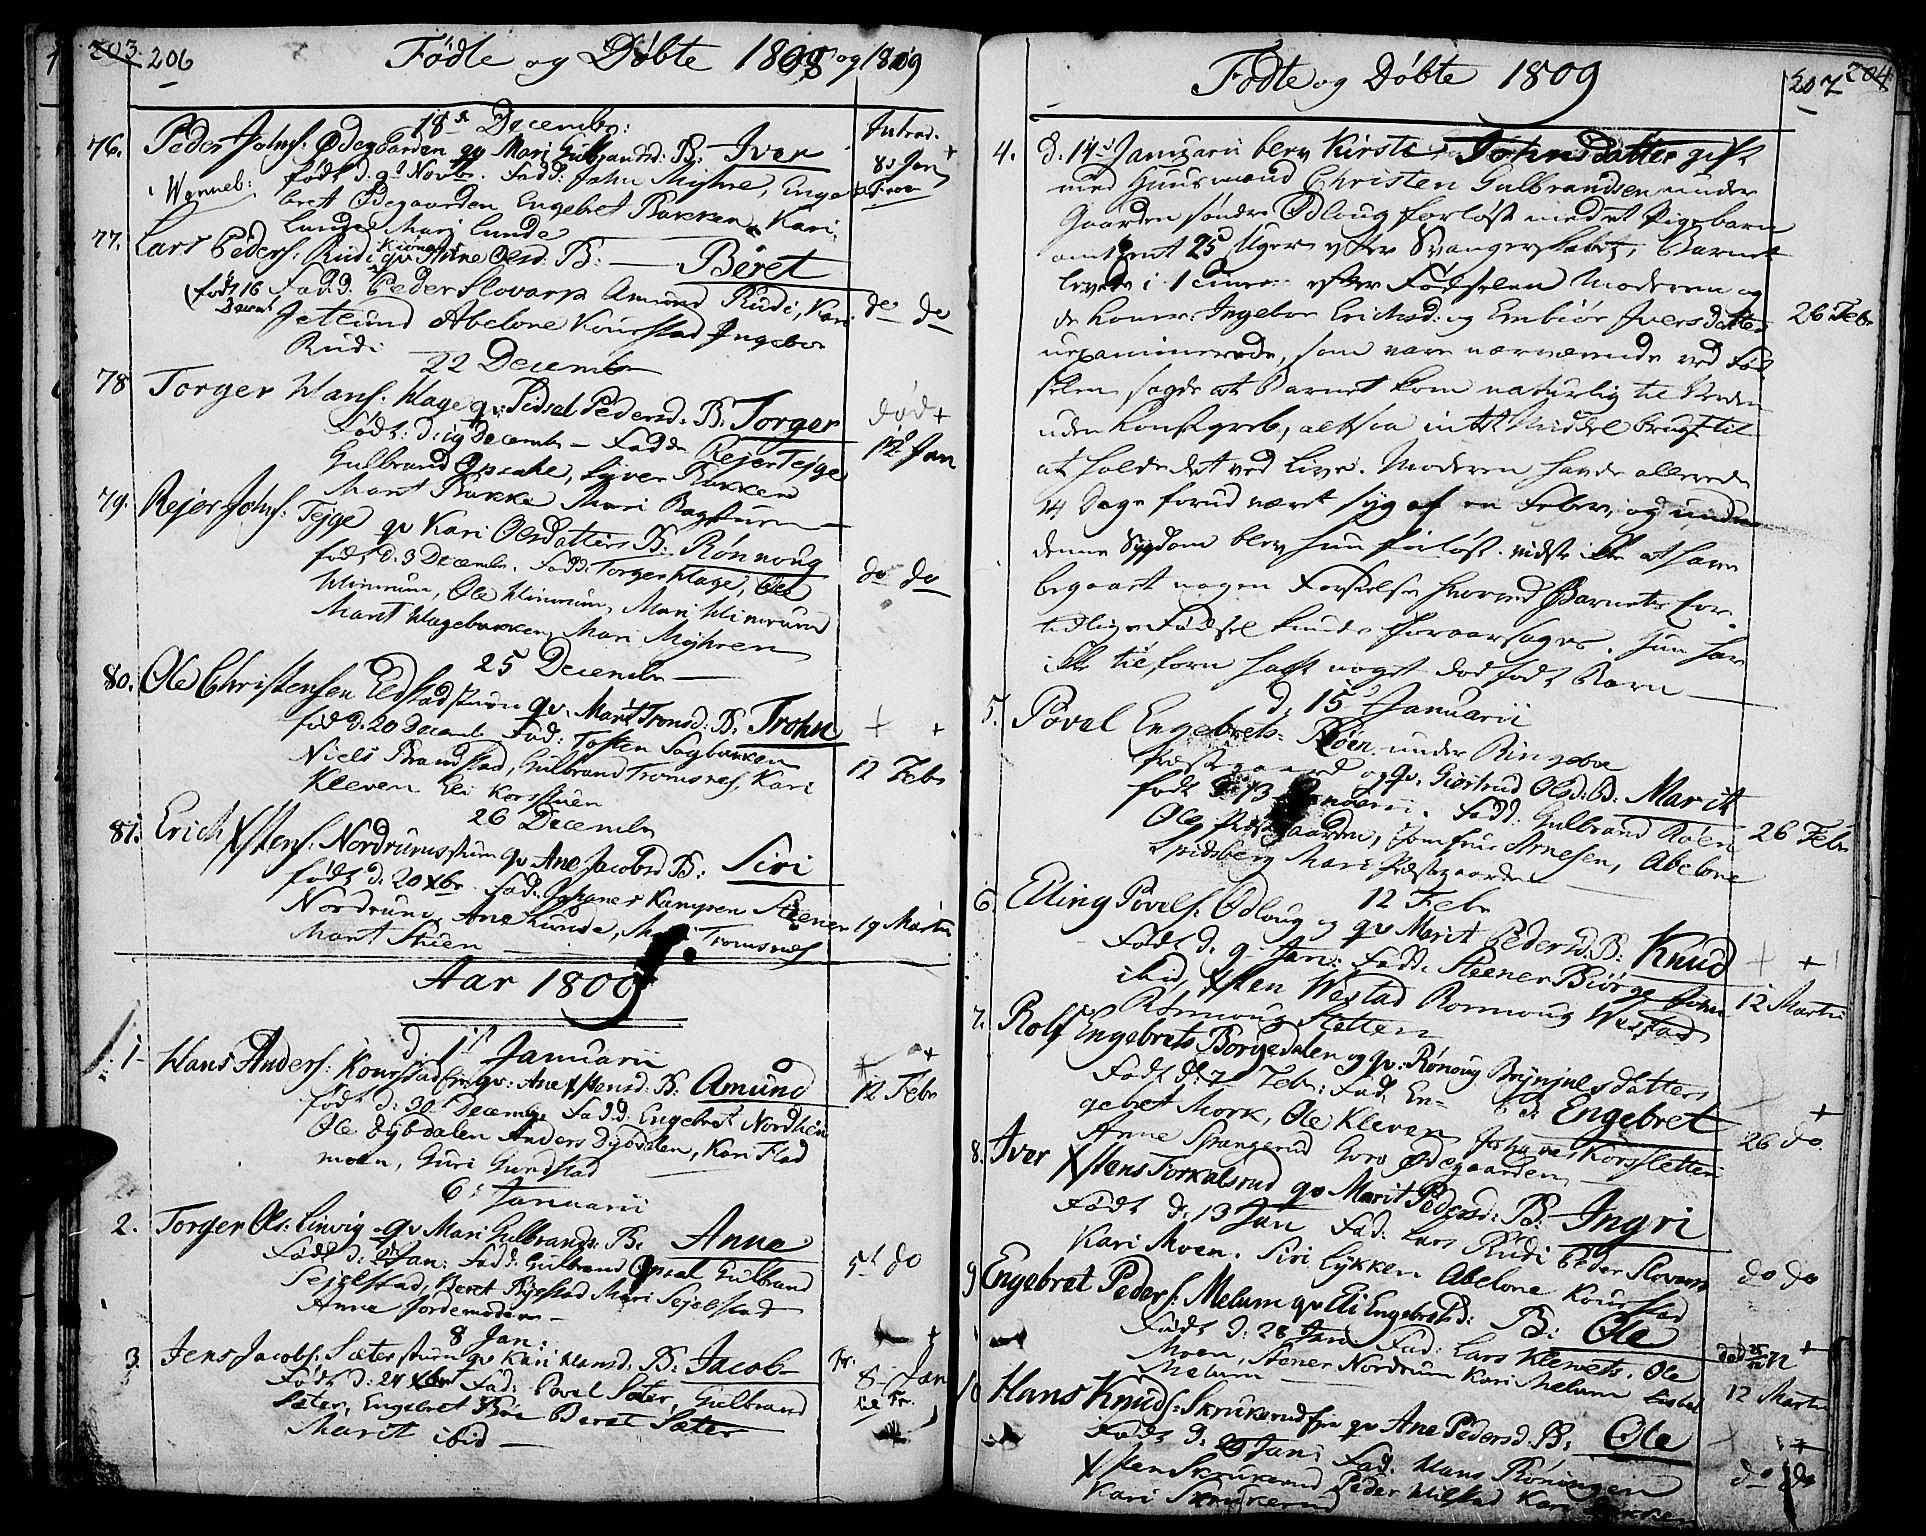 SAH, Ringebu prestekontor, Ministerialbok nr. 3, 1781-1820, s. 206-207